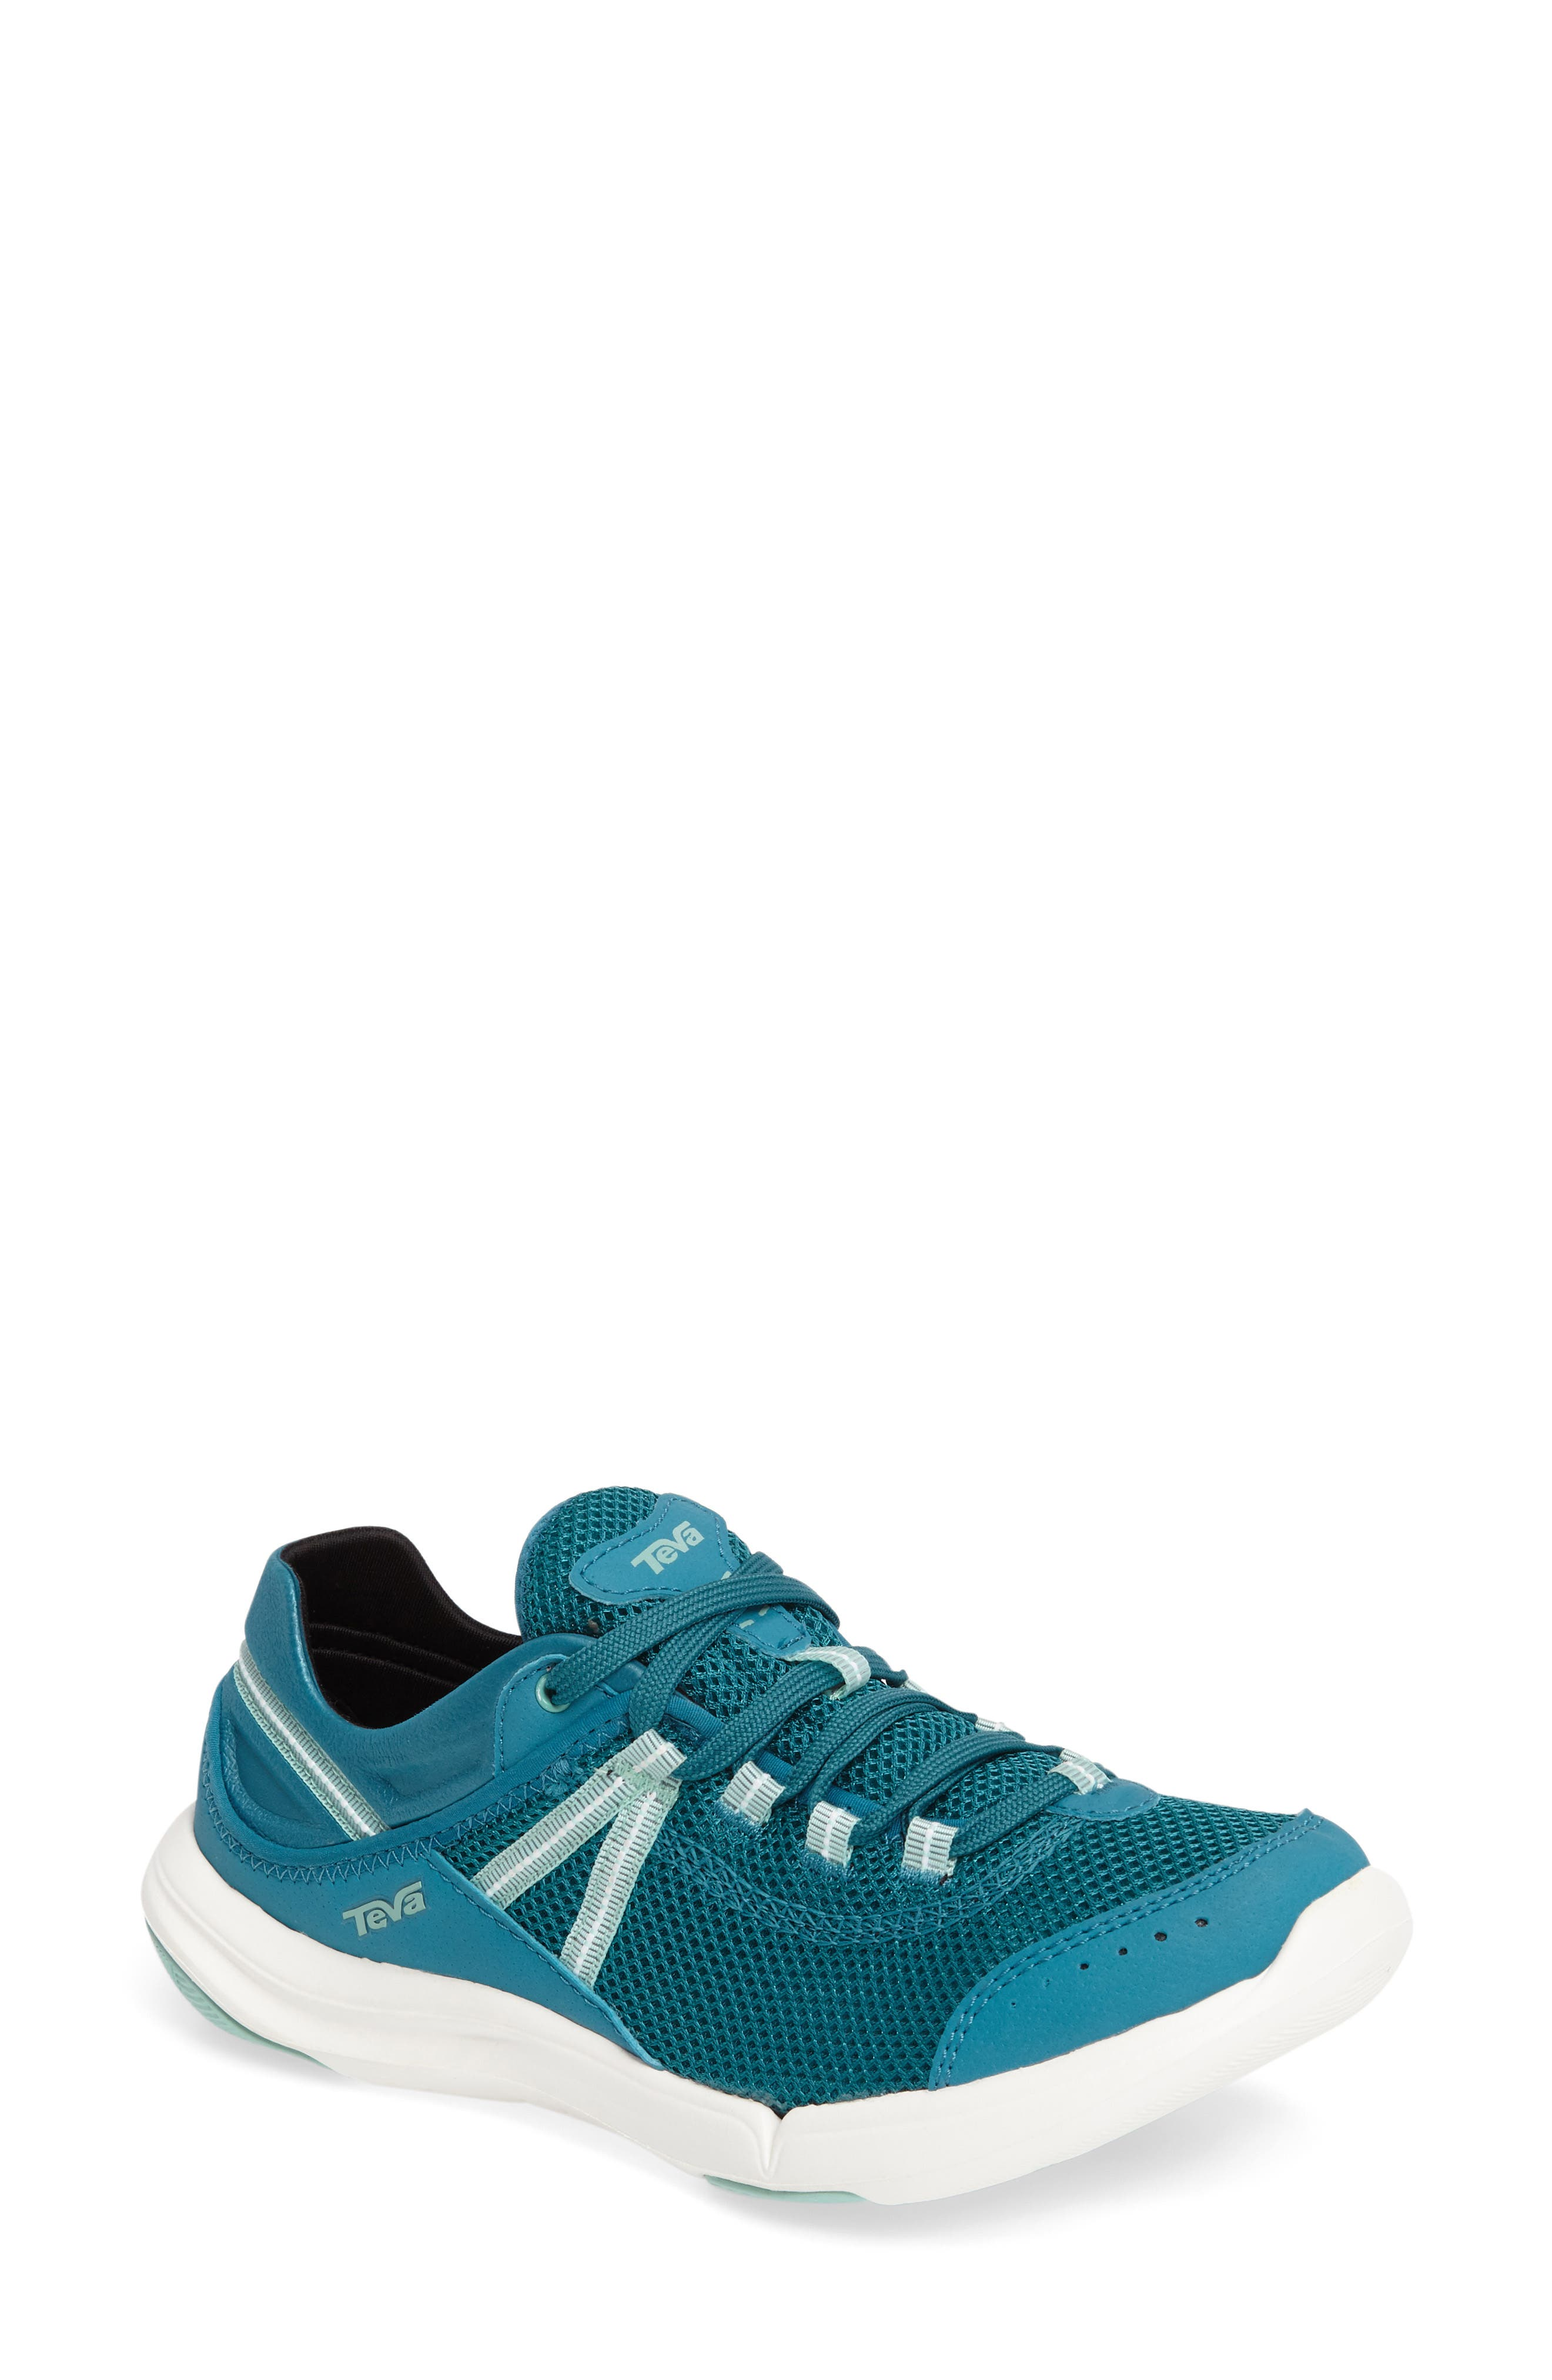 Evo Sneaker,                         Main,                         color, 405